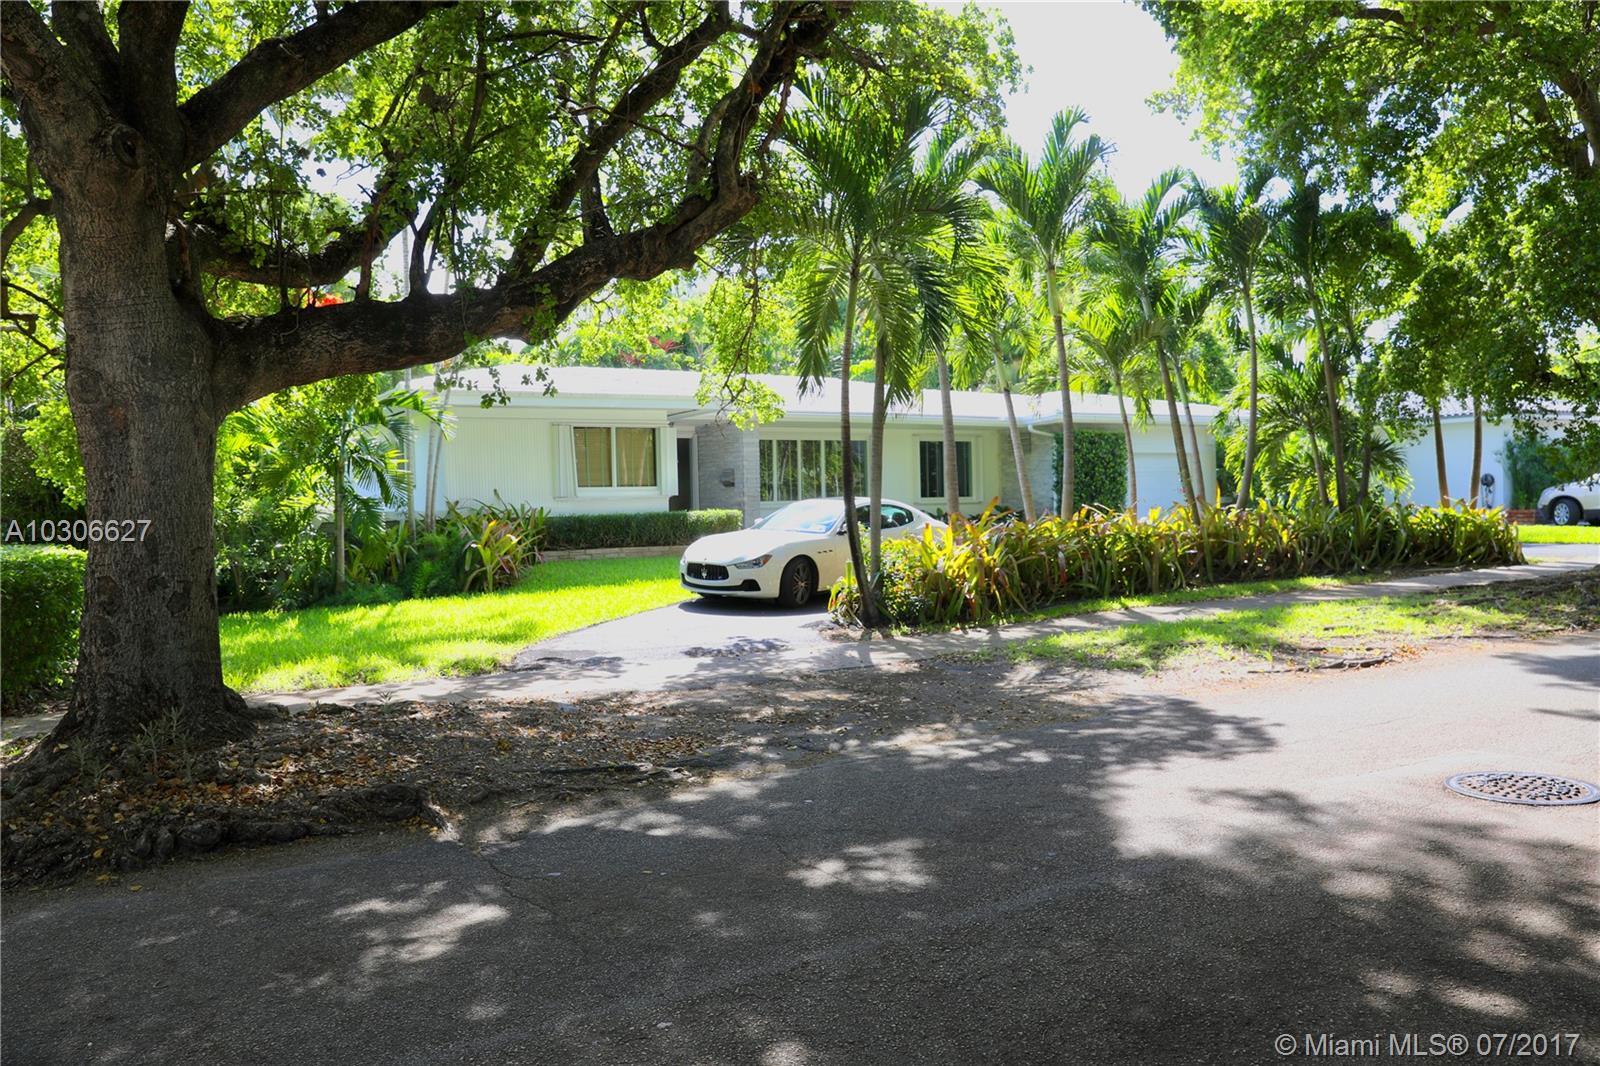 210 S Shore Dr - Miami, Florida